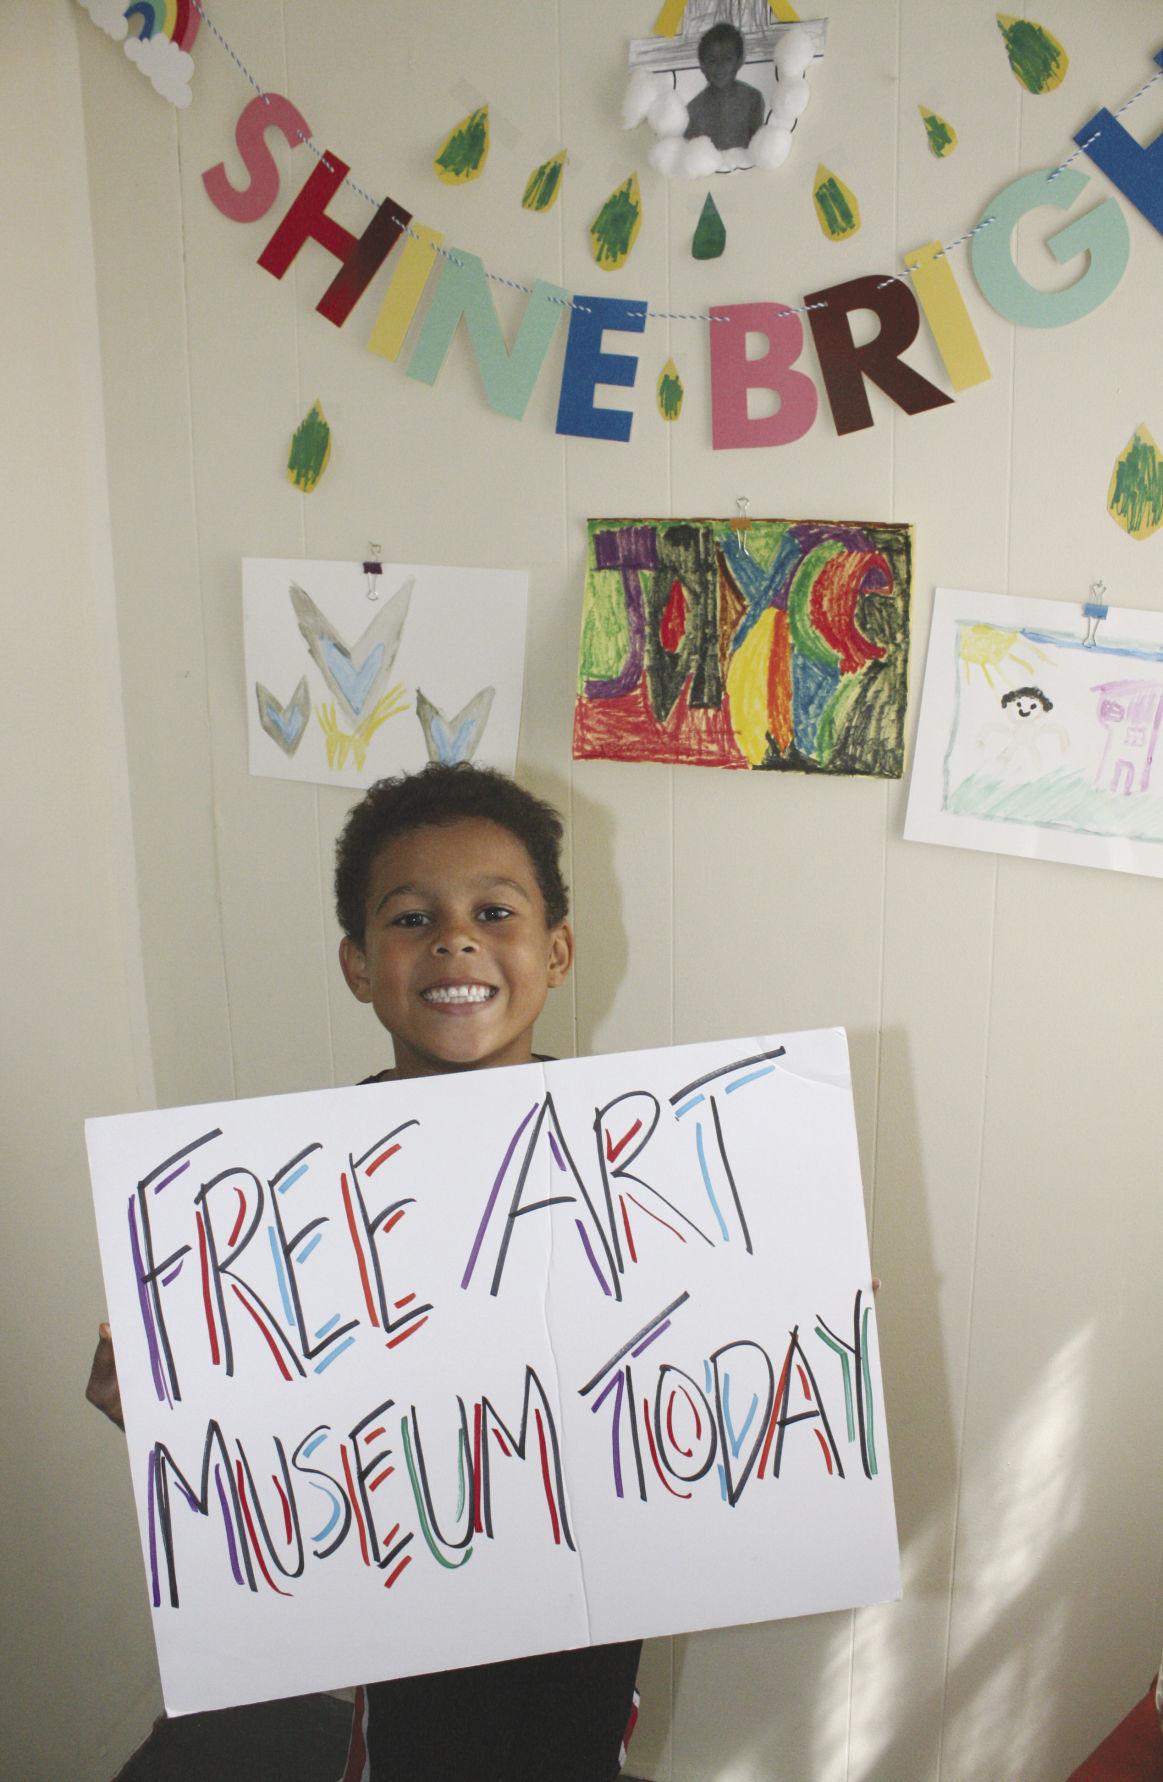 Art abounds for Sun Prairie kid